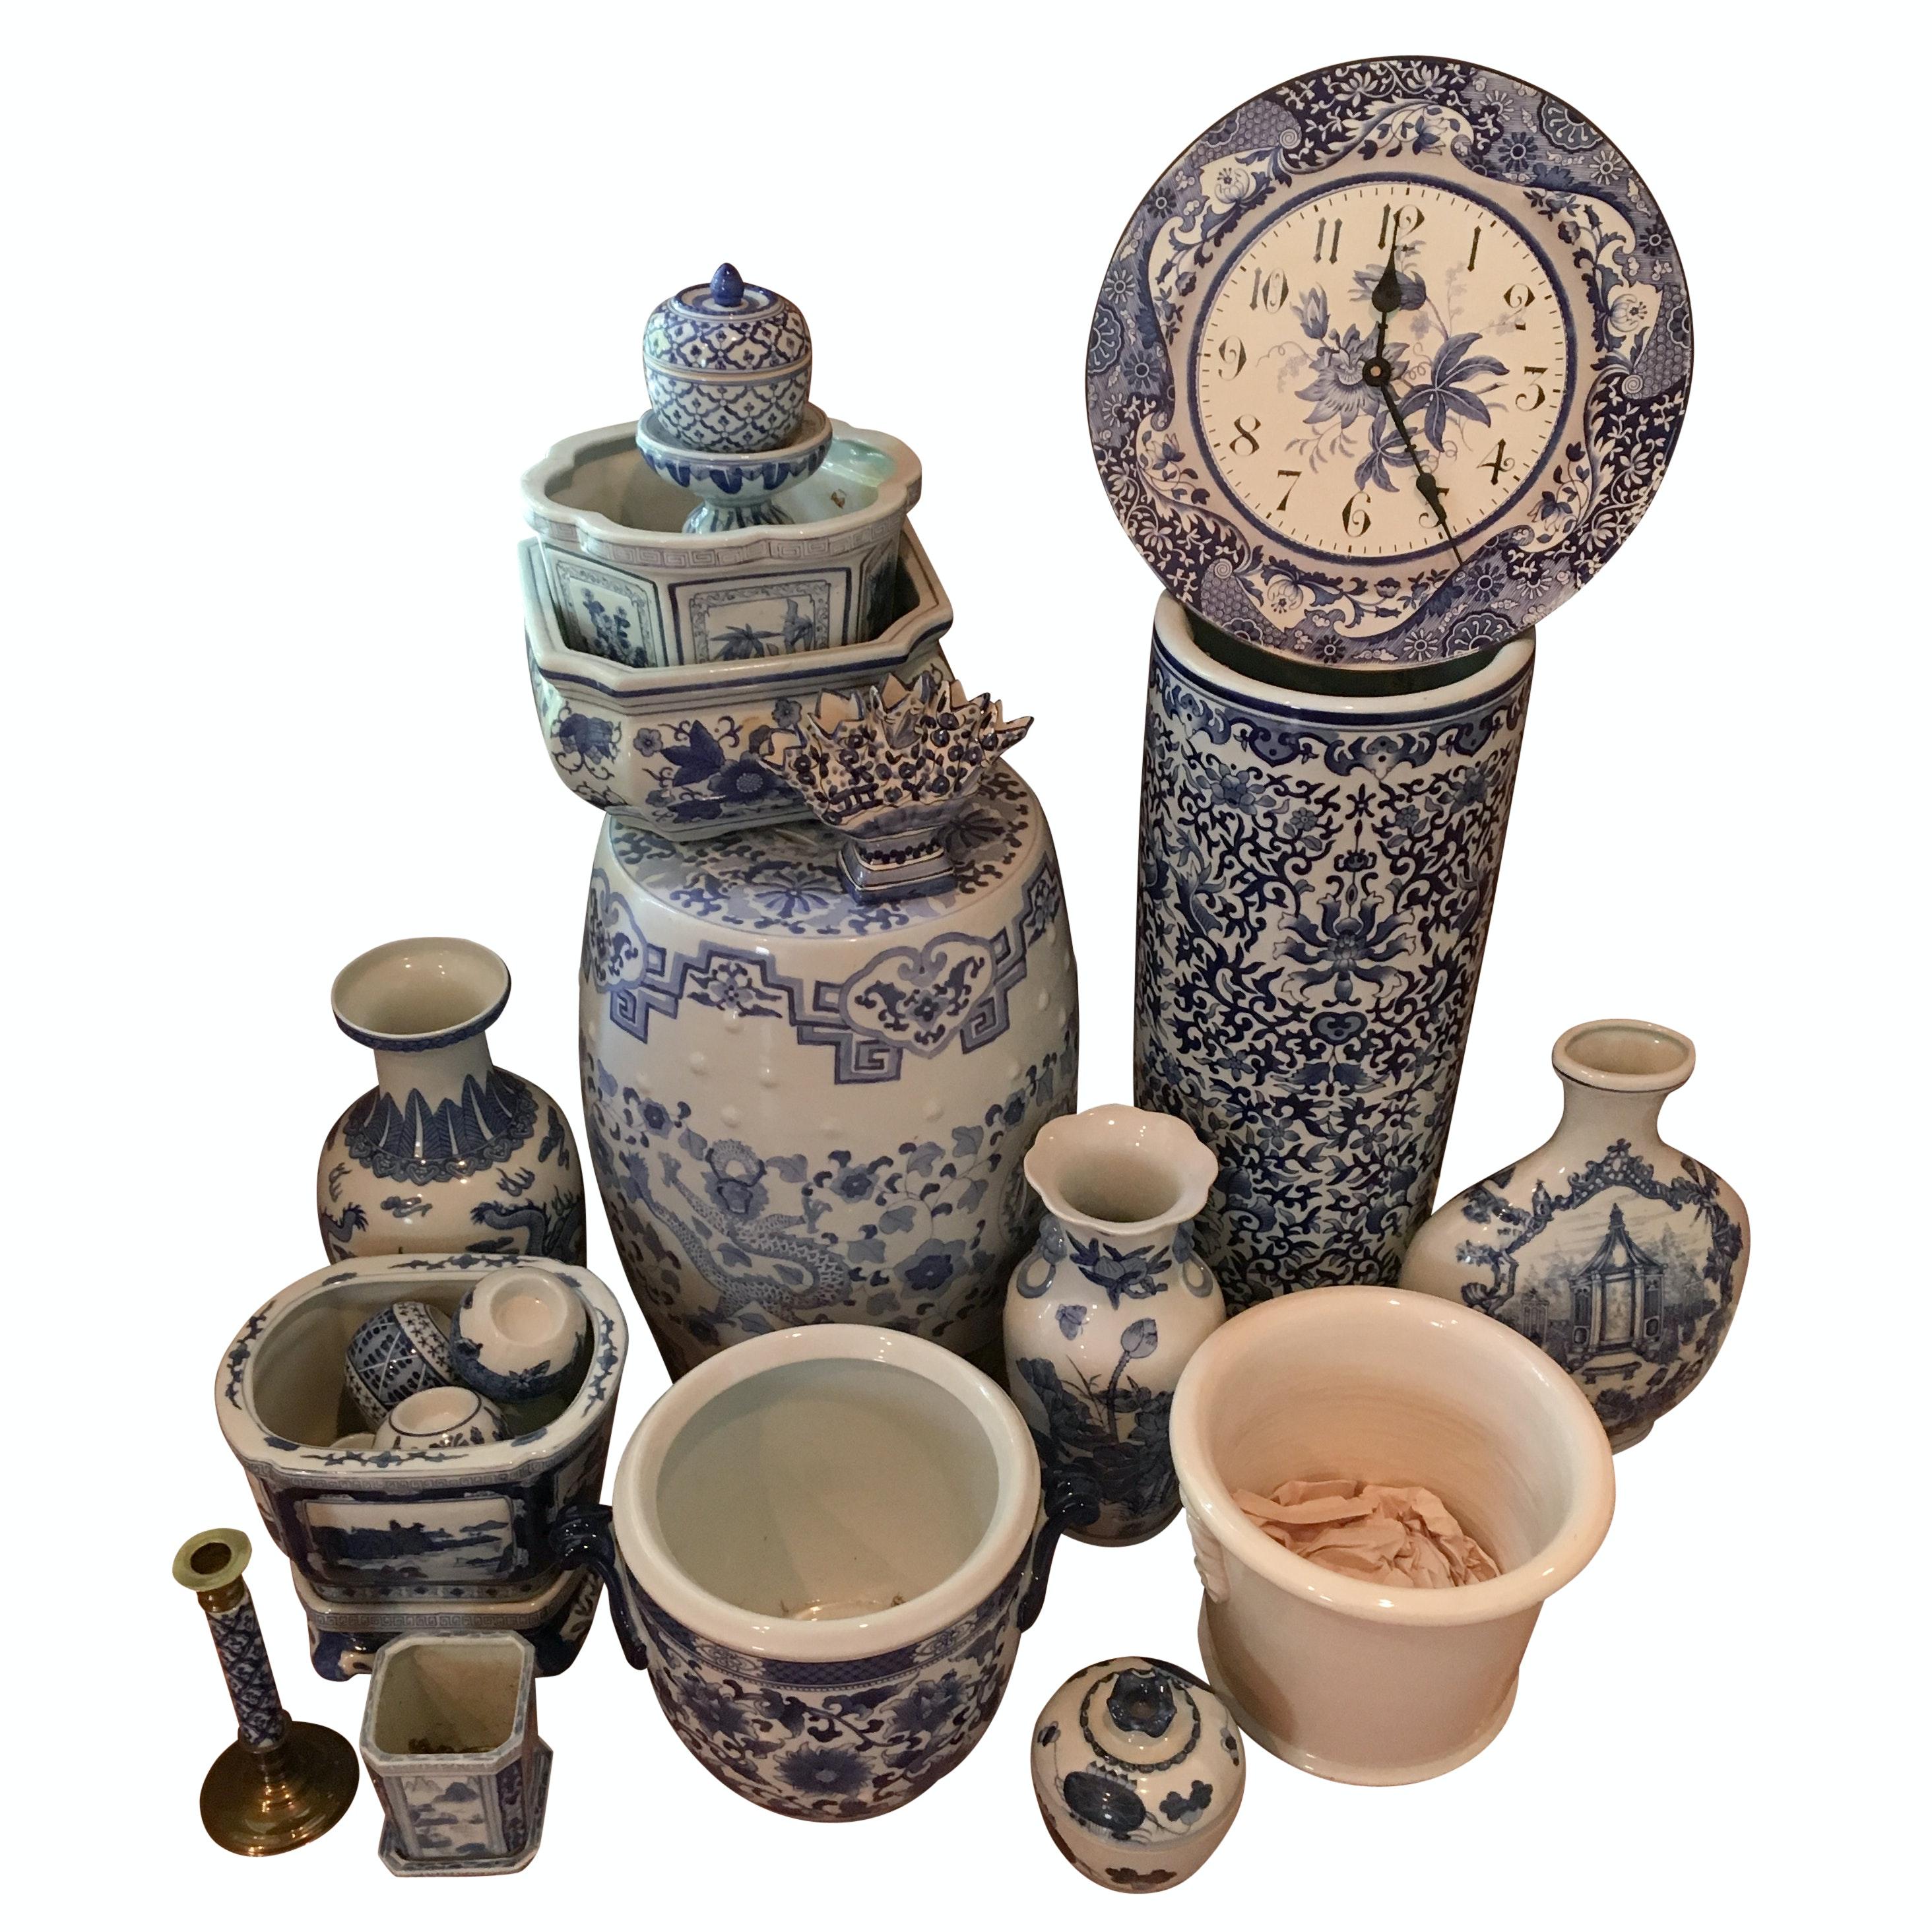 Blue and White Ceramic Decor